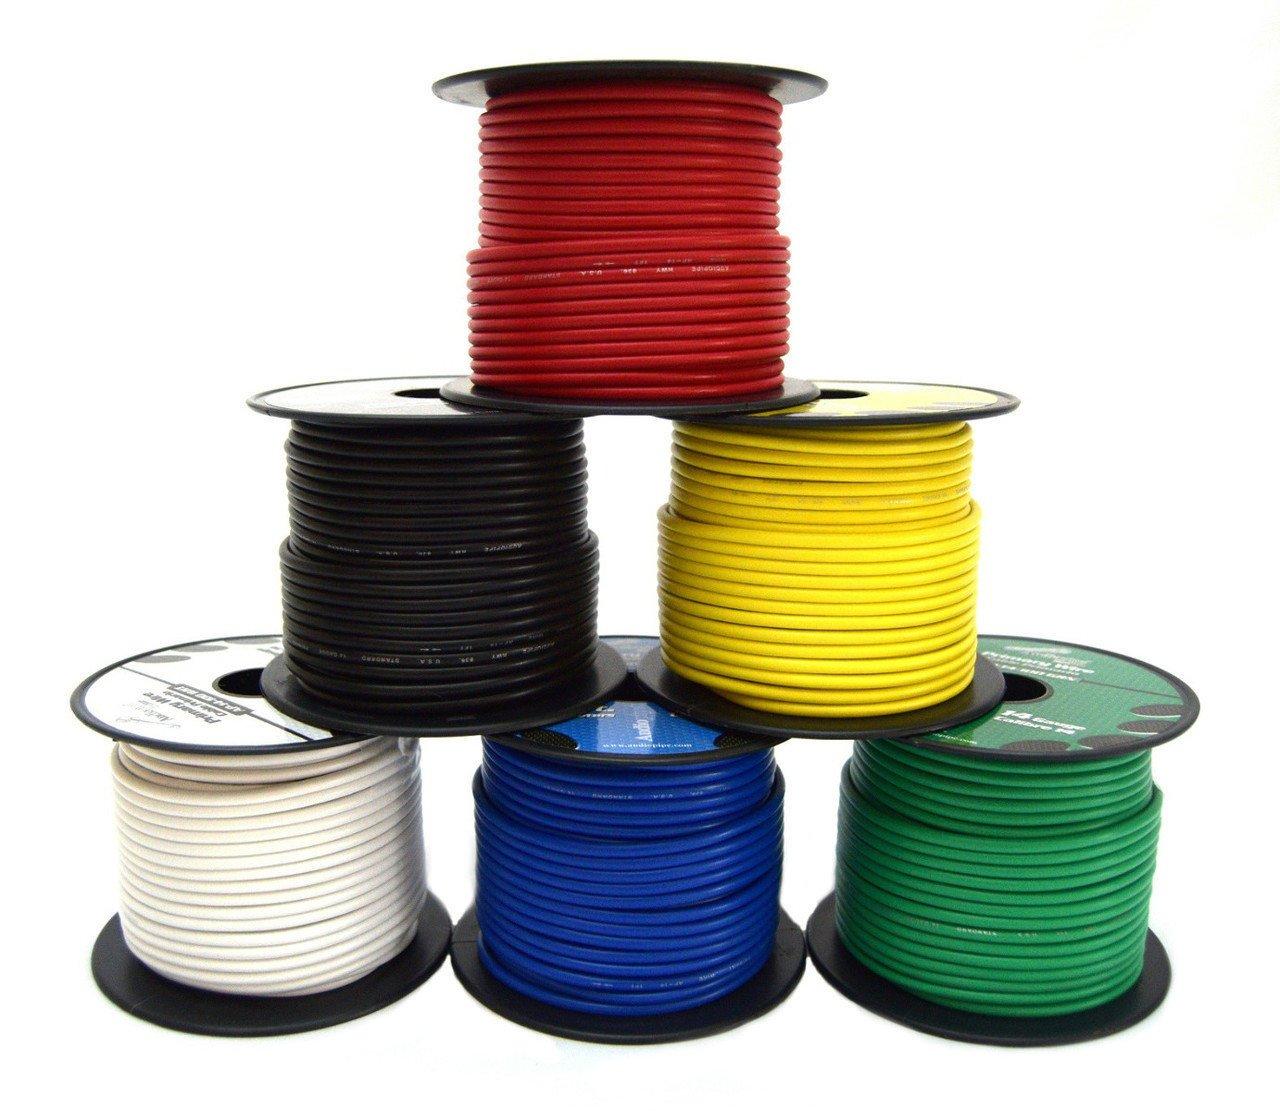 14 GA Single Conductor Stranded Remote Wire 6 Rolls Primary Colors 12V 100'FT EA